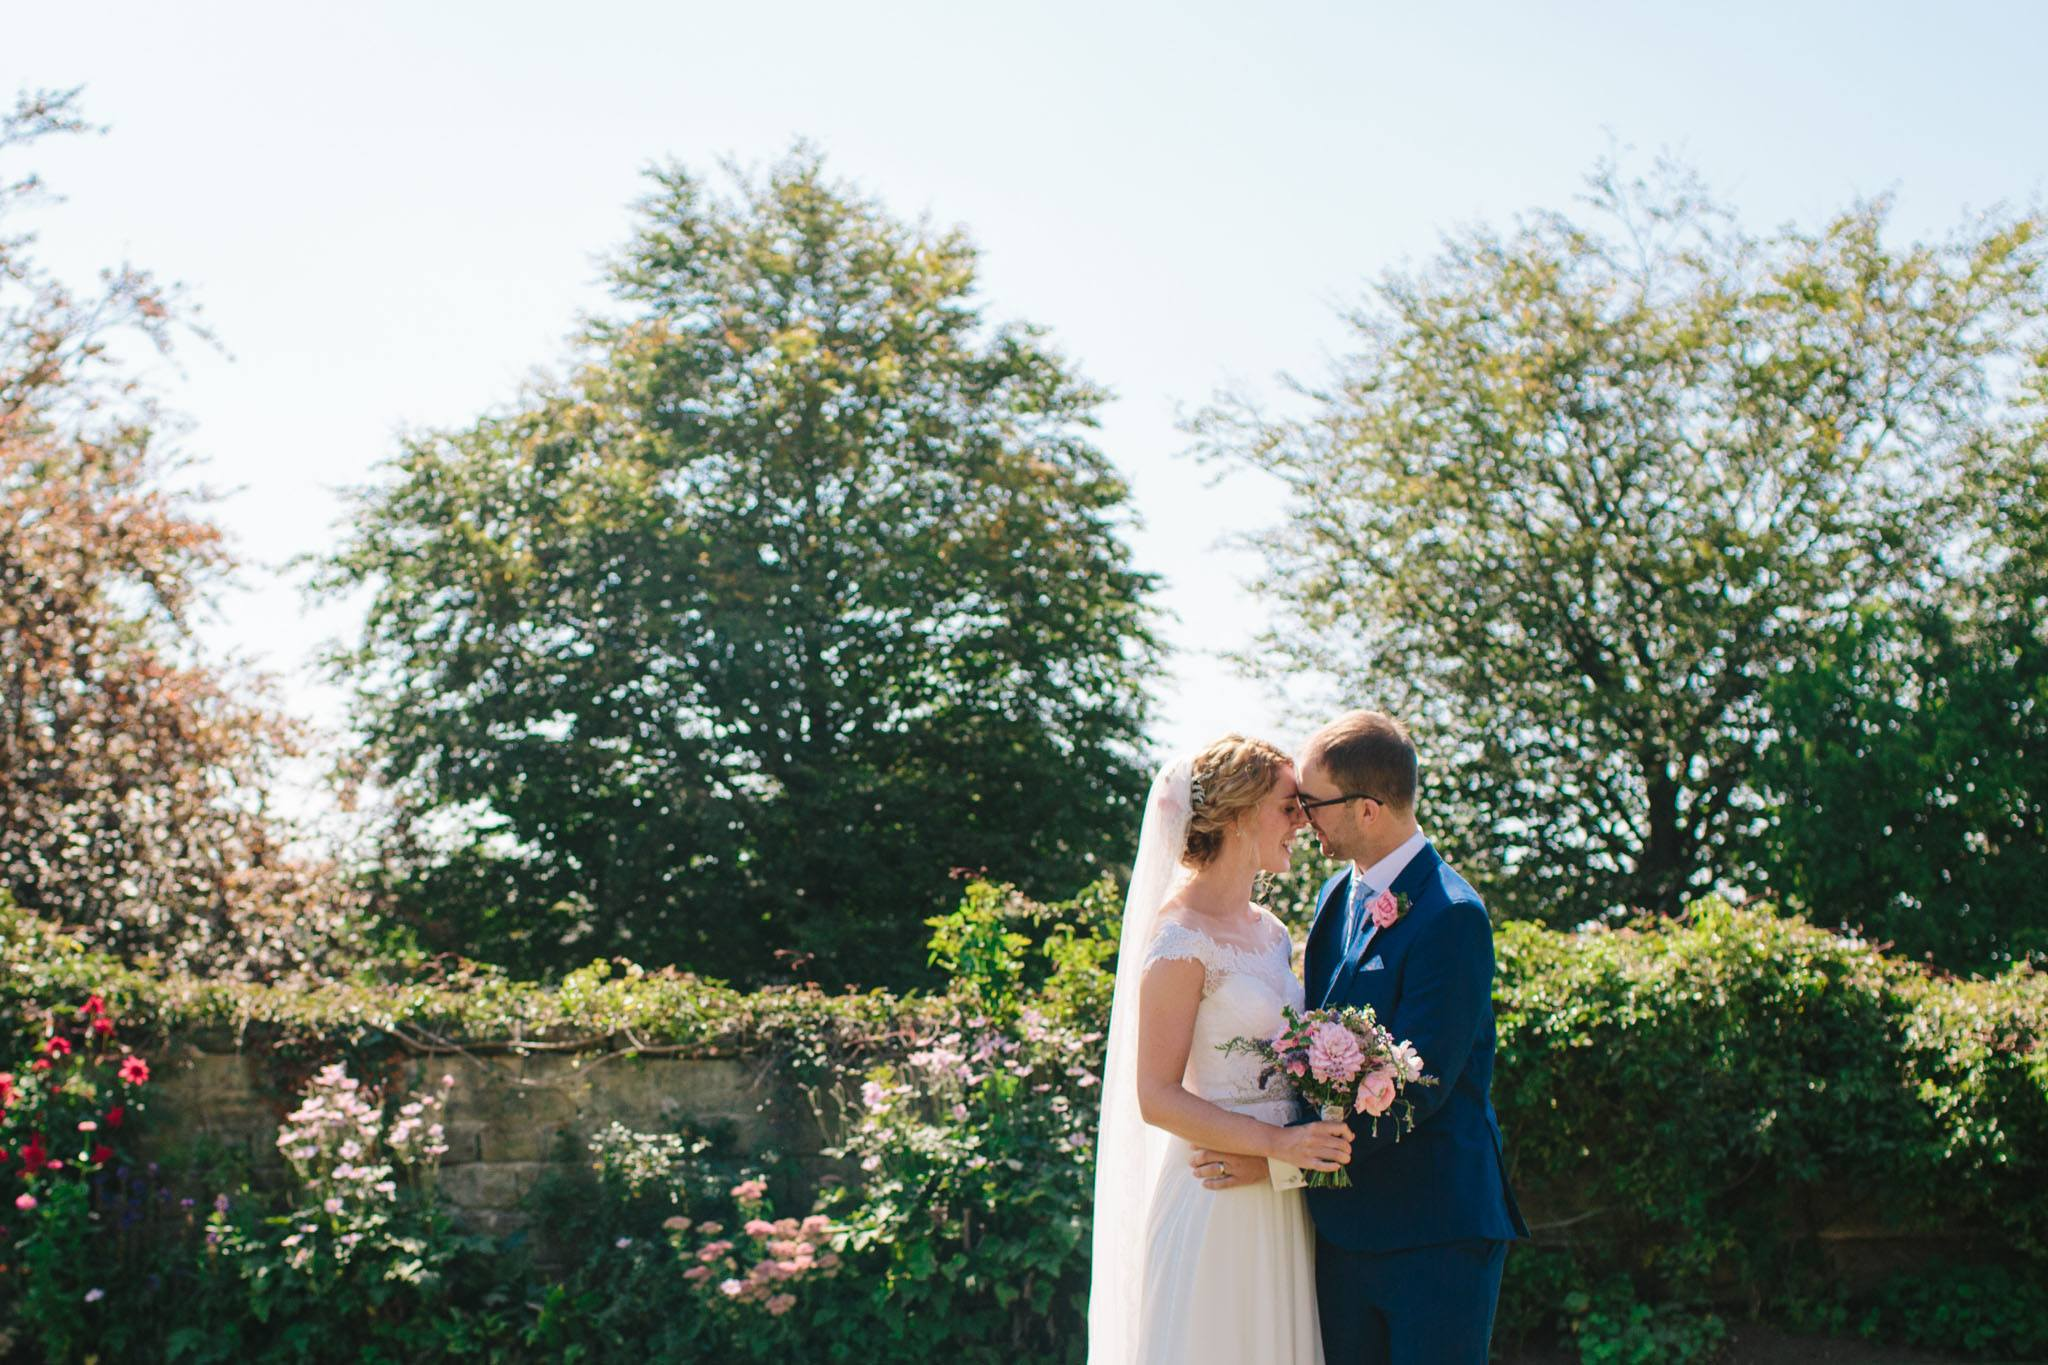 hendall manor barns wedding venue